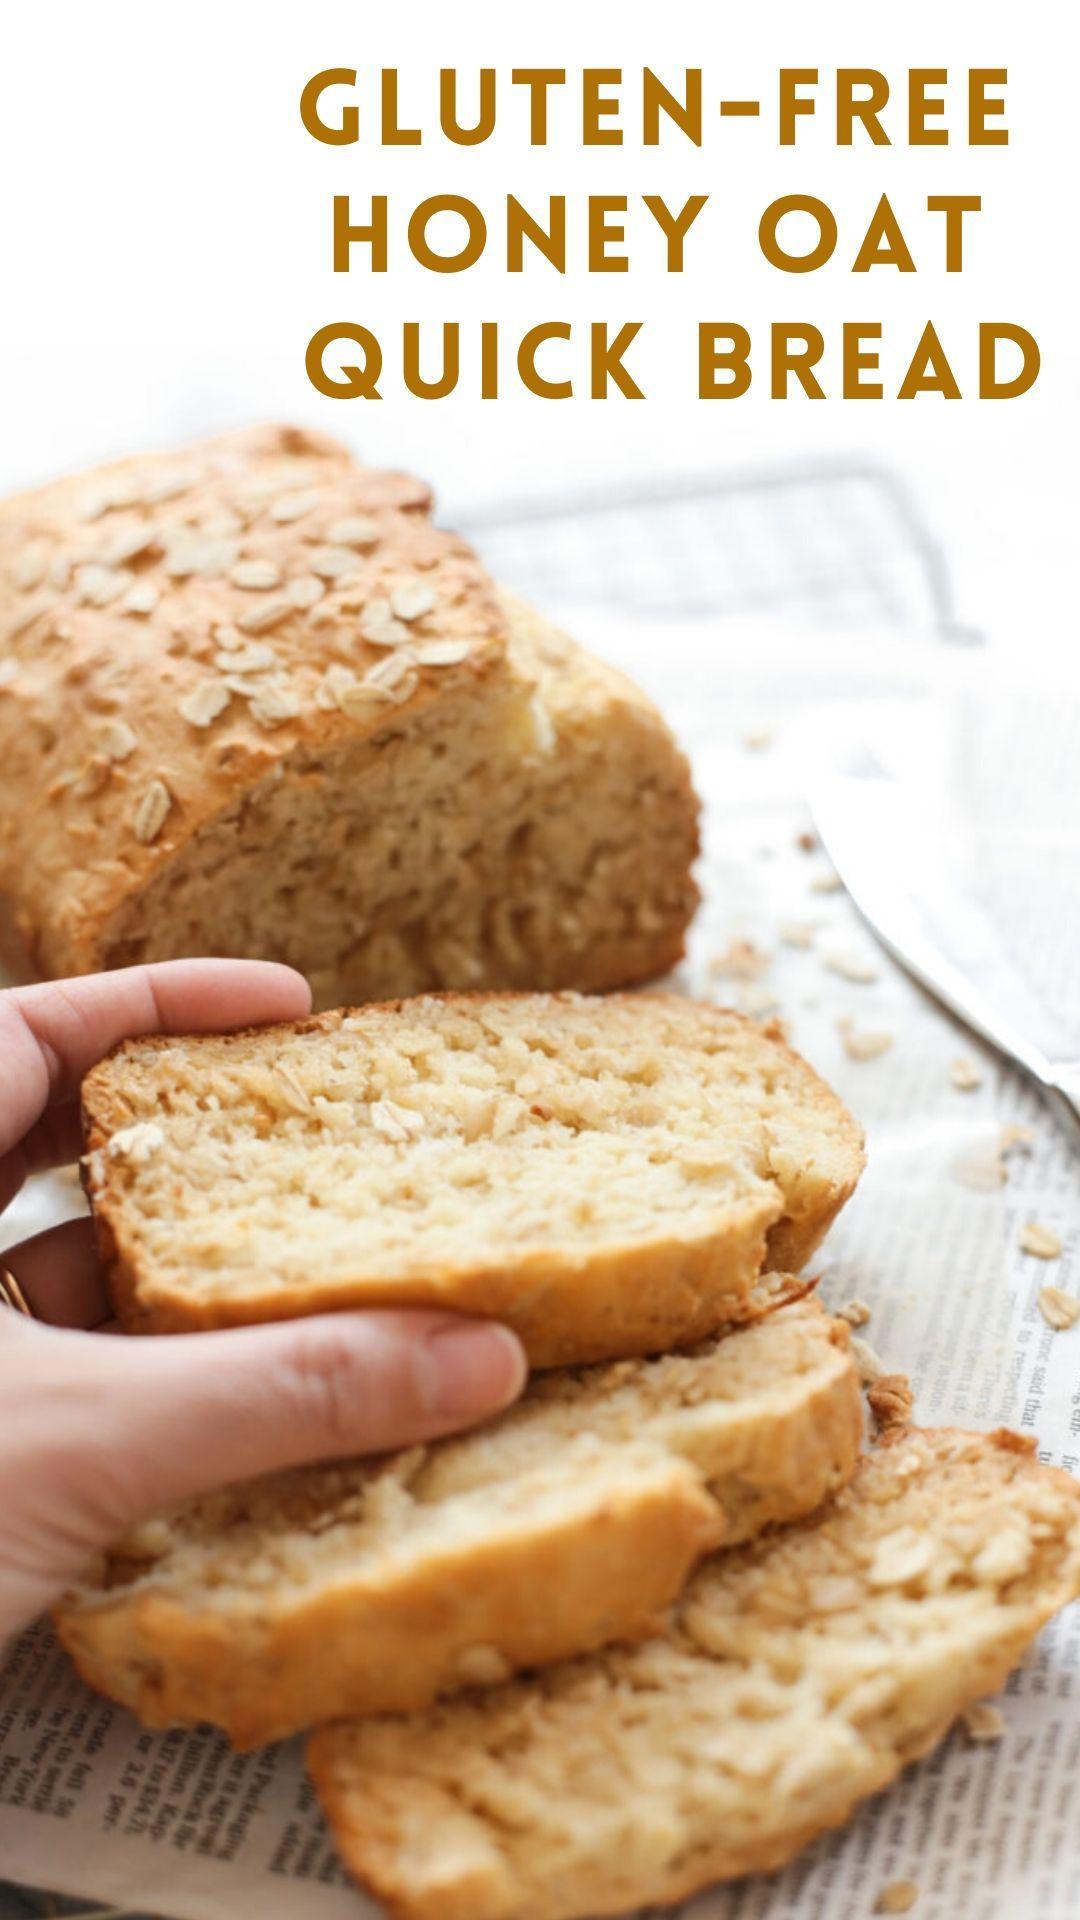 Gluten Free Honey Oat Quick Bread Dish By Dish Recipe In 2020 Gluten Free Honey Oat Gluten Free Honey Oat Bread Gluten Free Recipes Bread